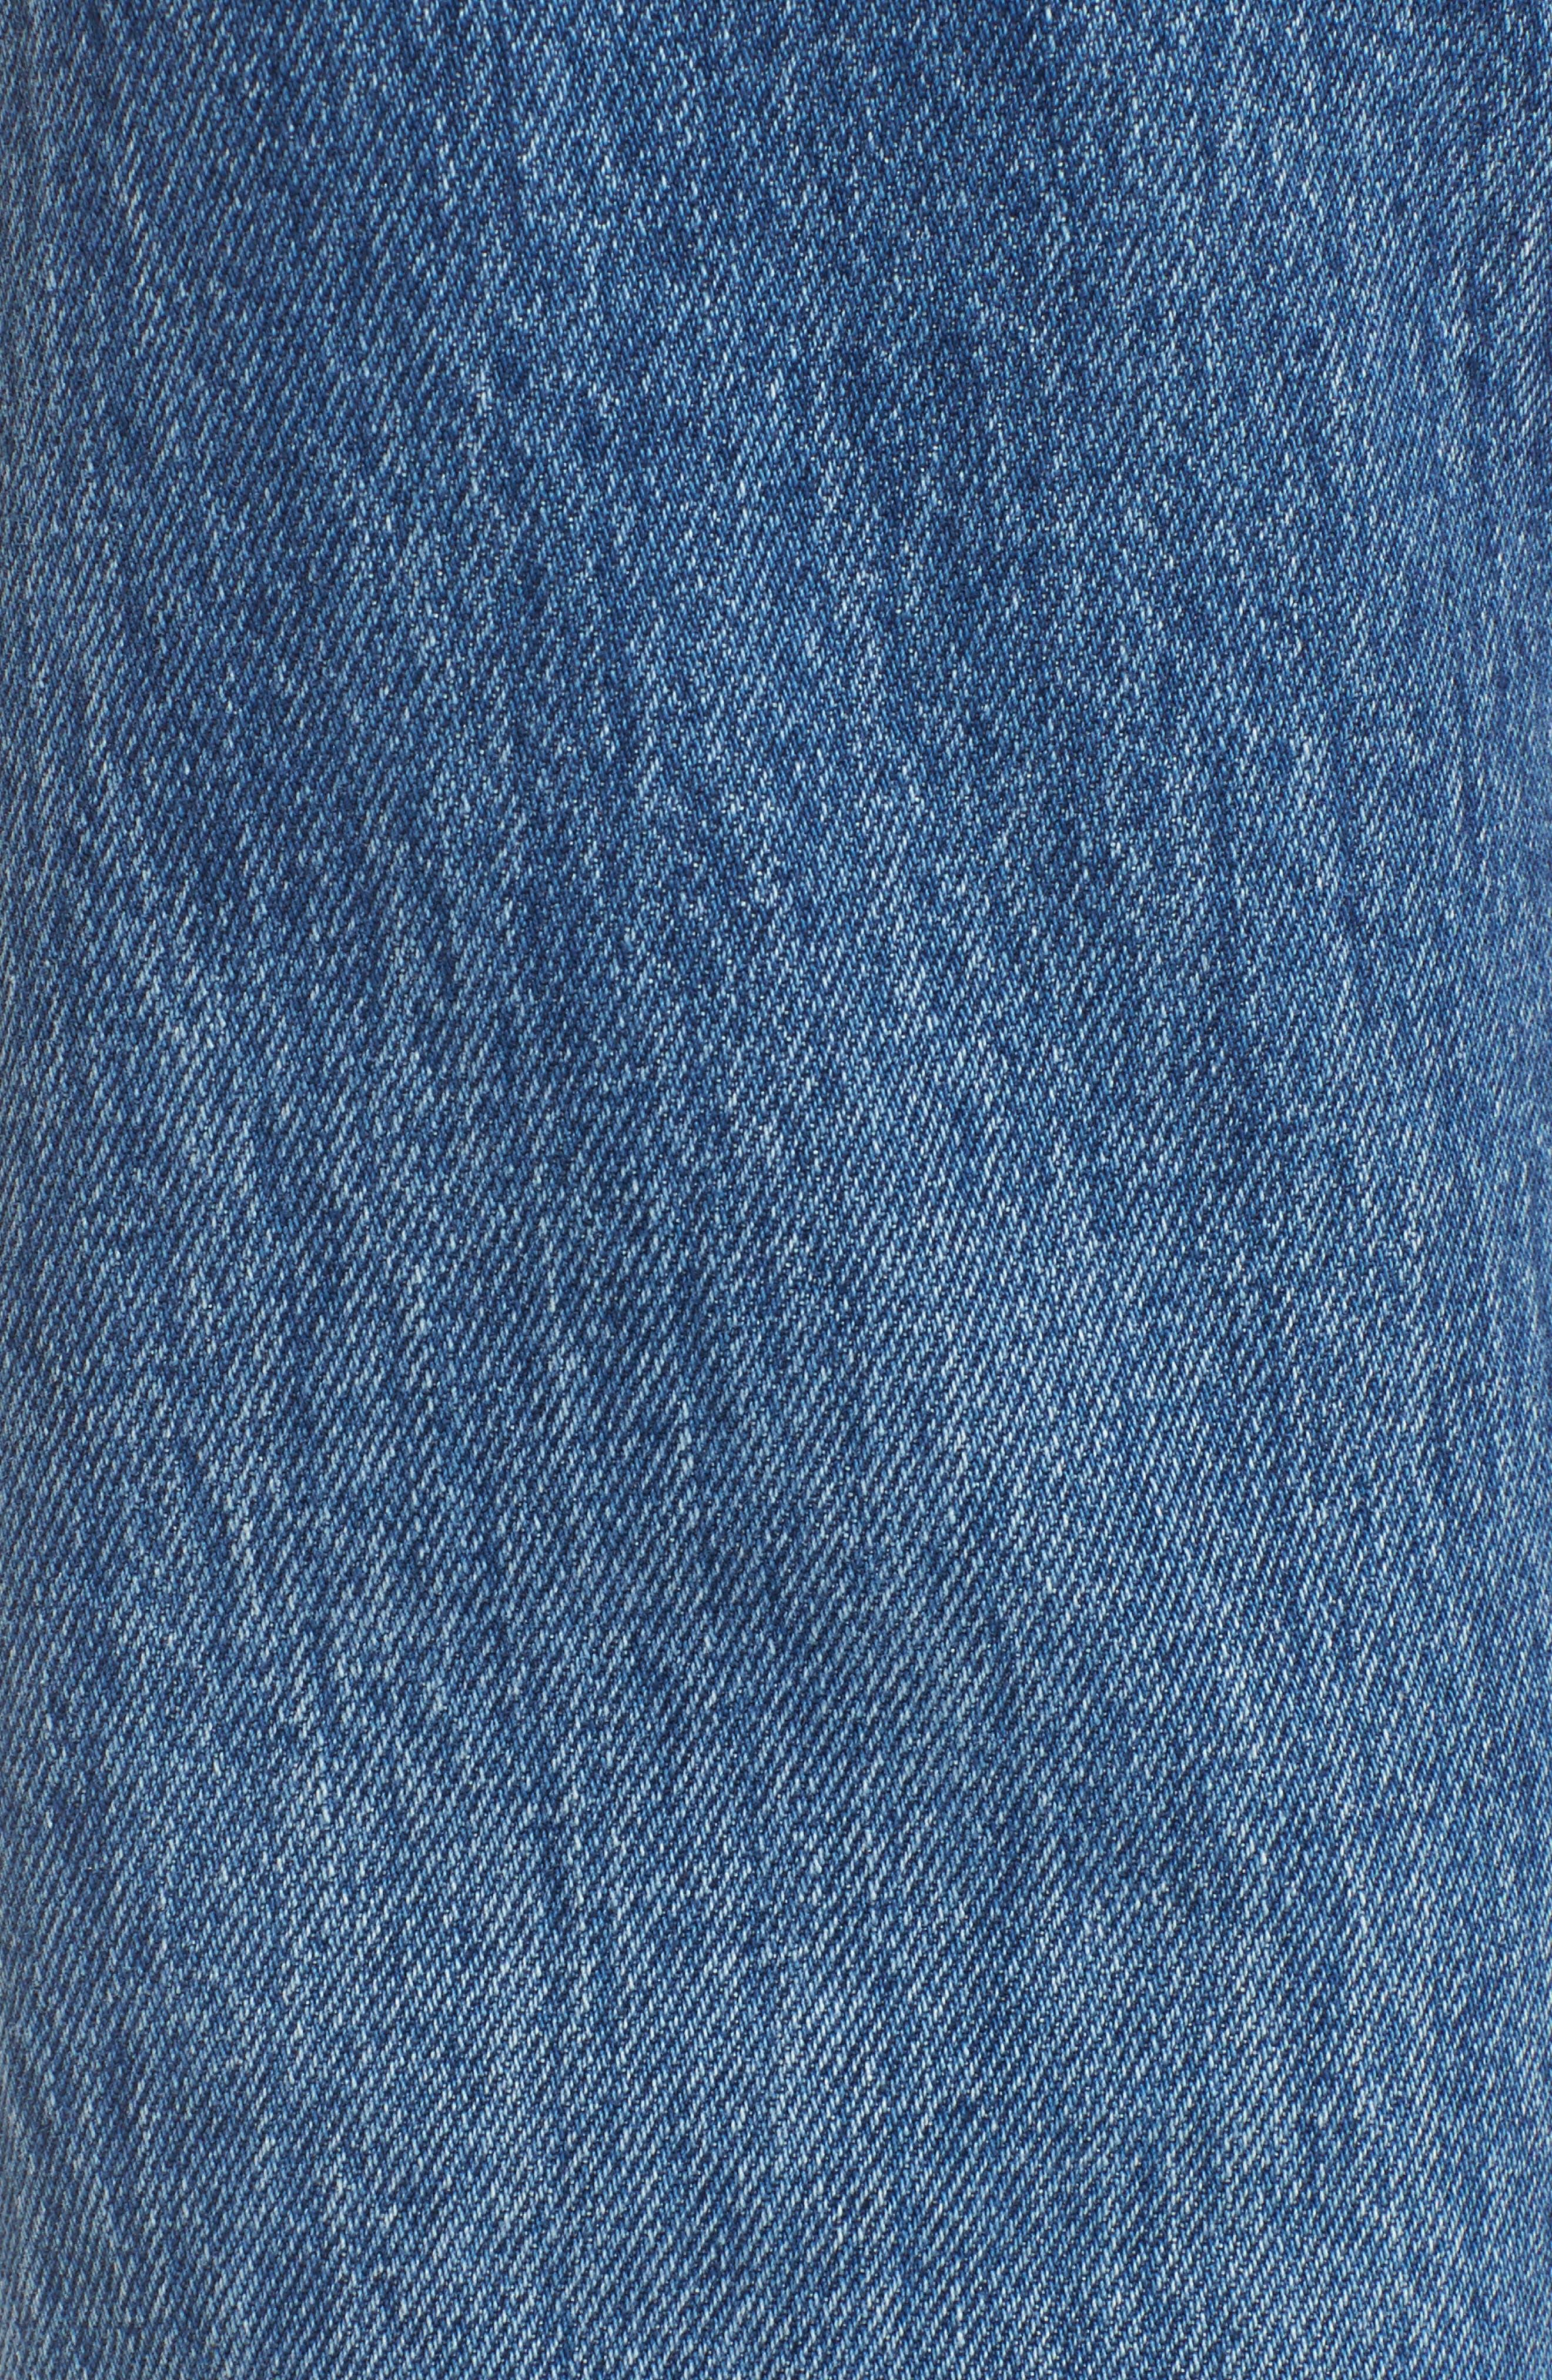 Jeans Smith Rhinestone Crop Boyfriend Jeans,                             Alternate thumbnail 5, color,                             450